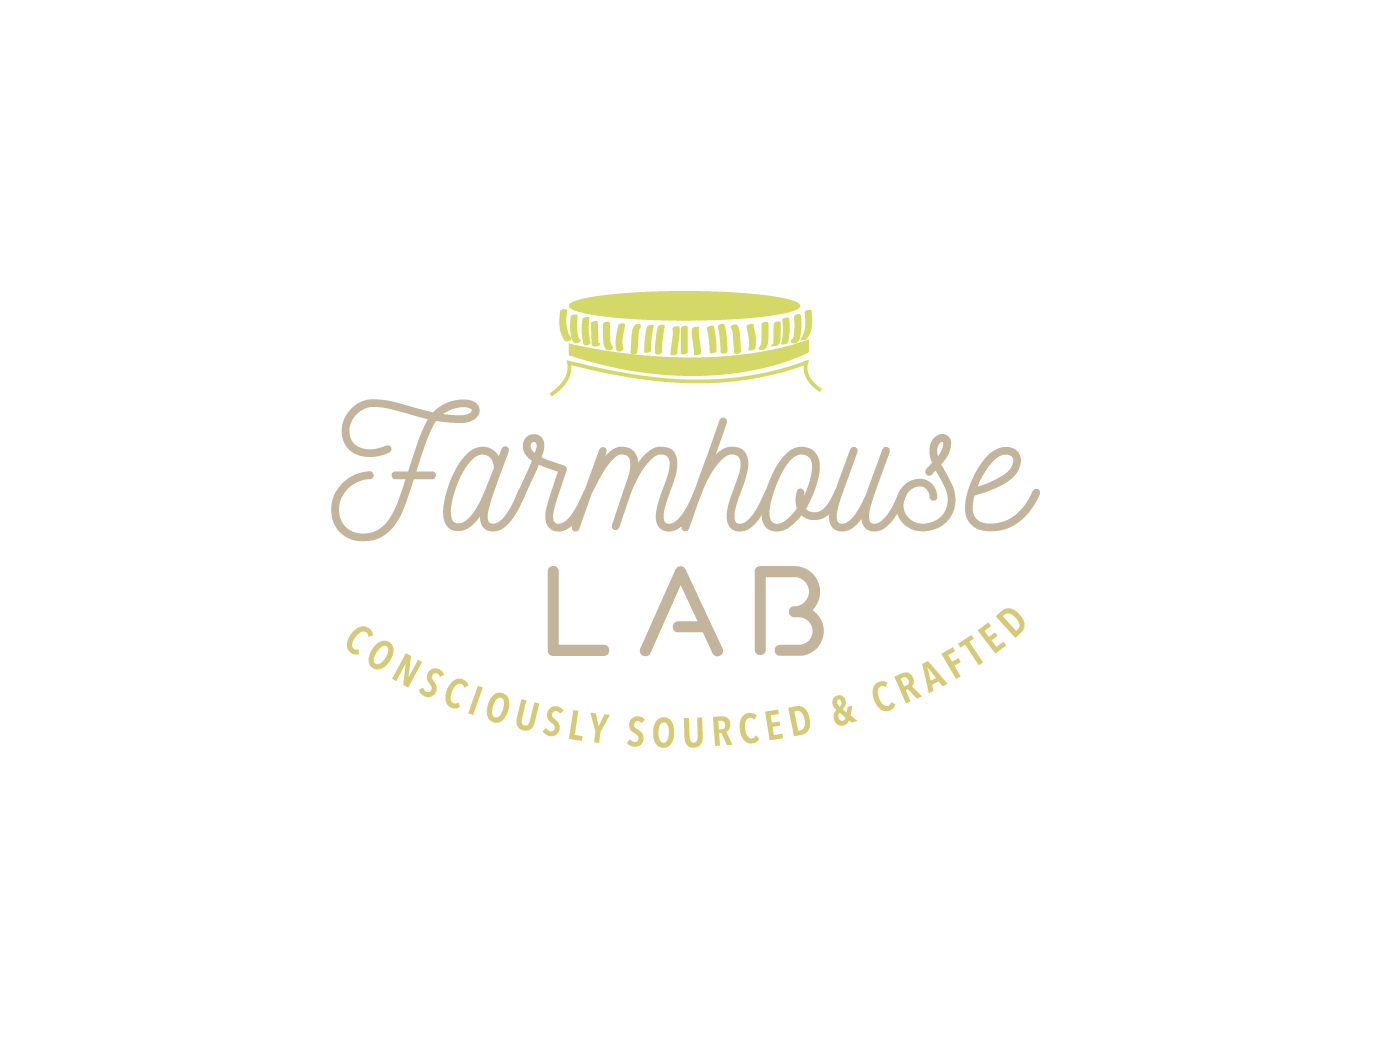 Farmhouse lab logo.png